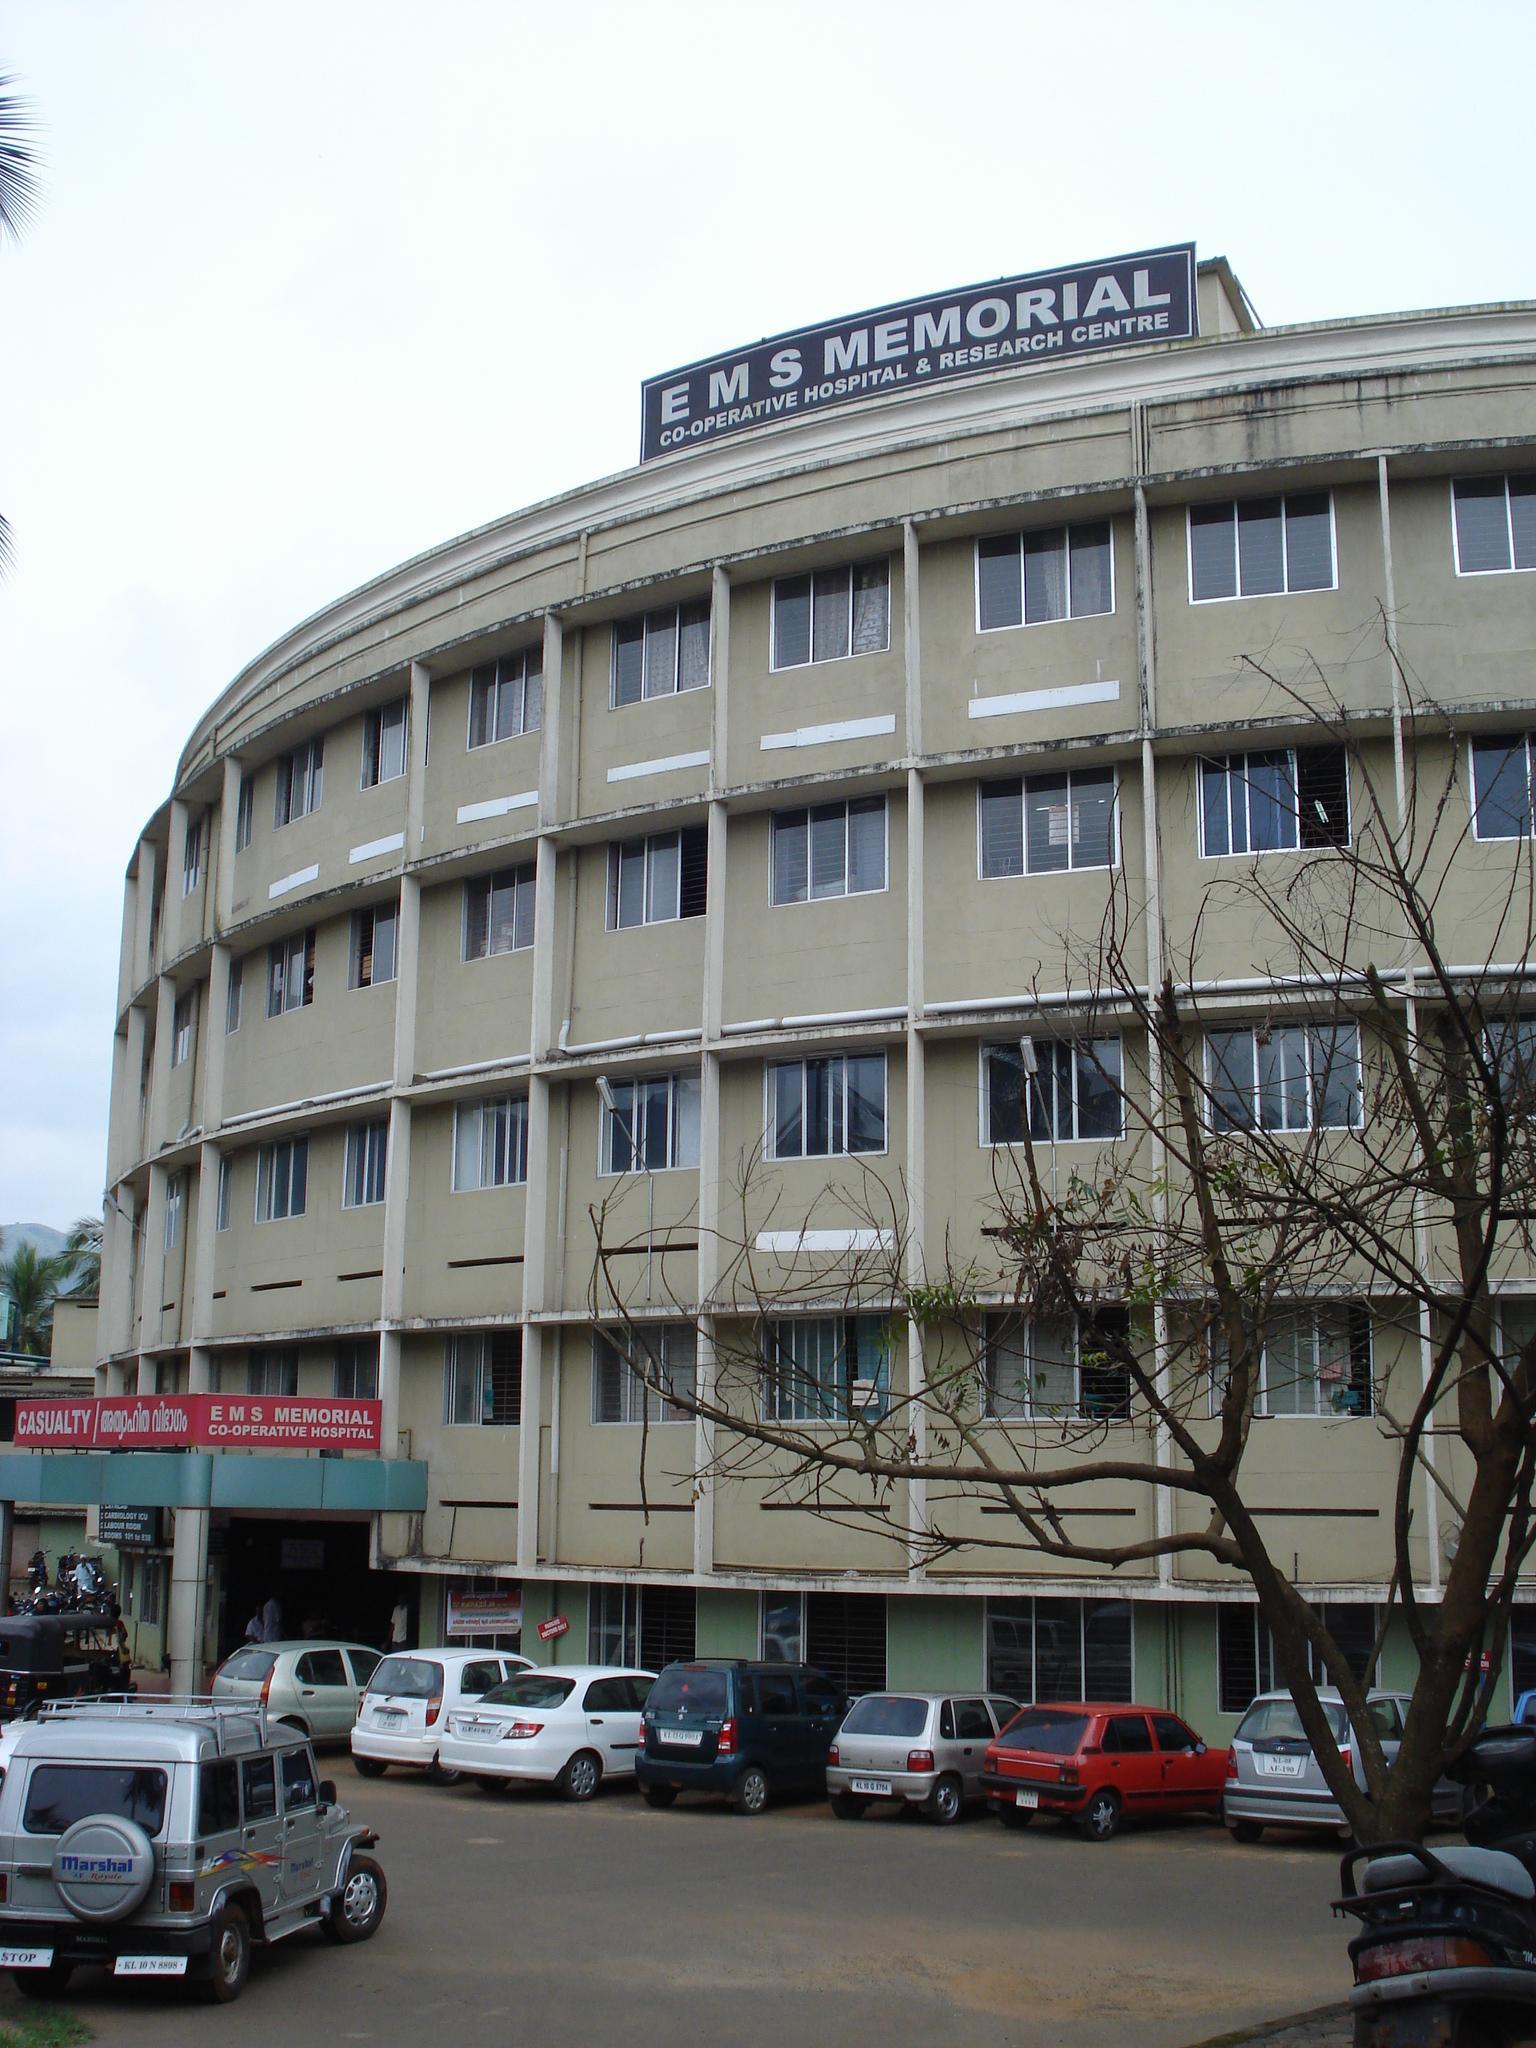 The E.M.S. Memorial Co-operative Hospital in Perinthalmanna